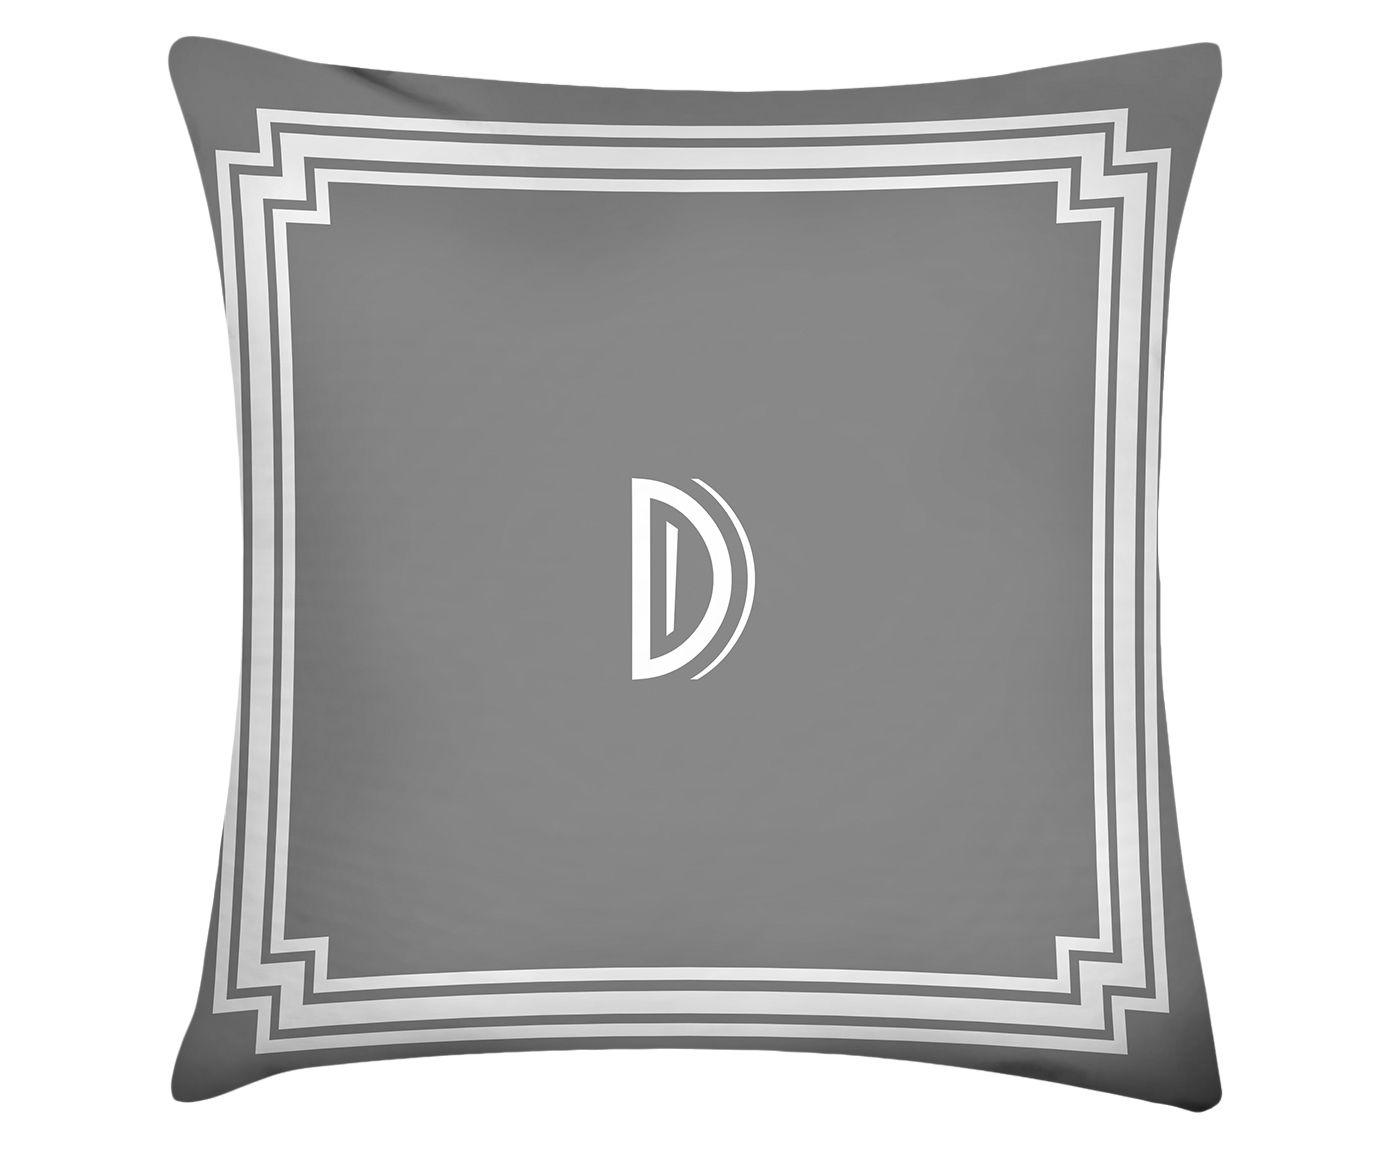 Almofada Letter D - 45x45cm | Westwing.com.br